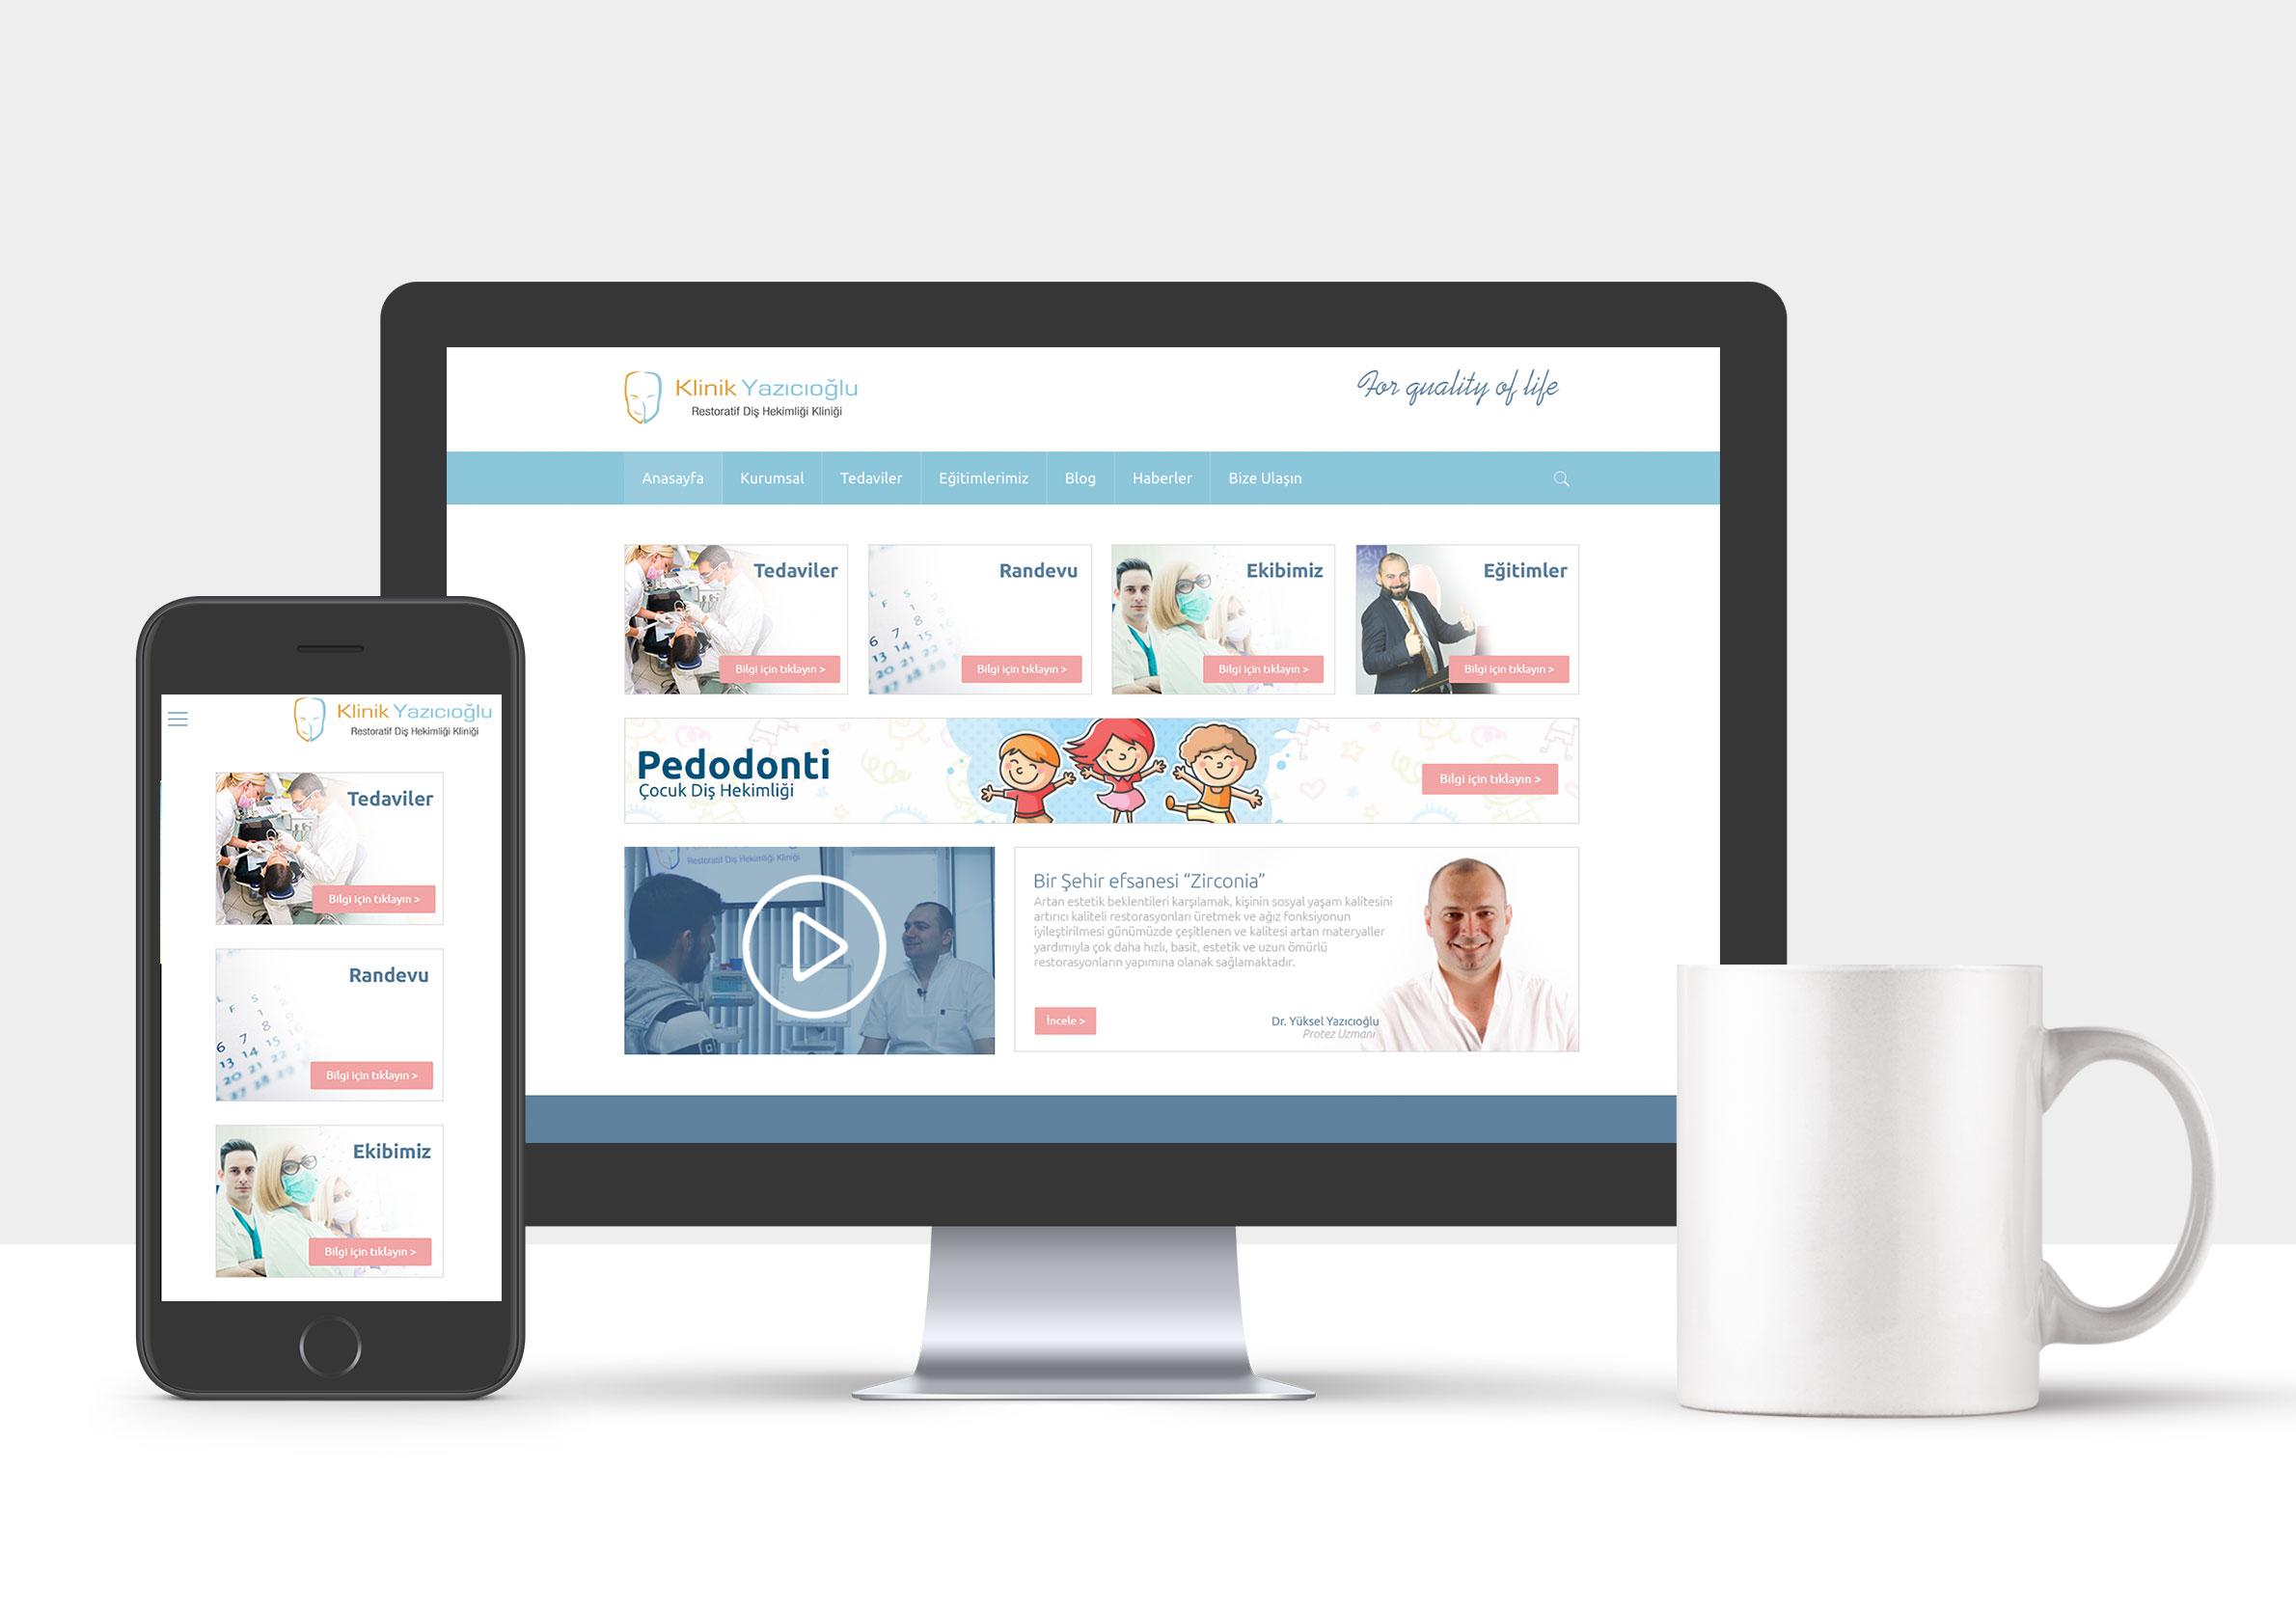 klinik-yazicioglu-kurumsal-web-tasarim.jpg